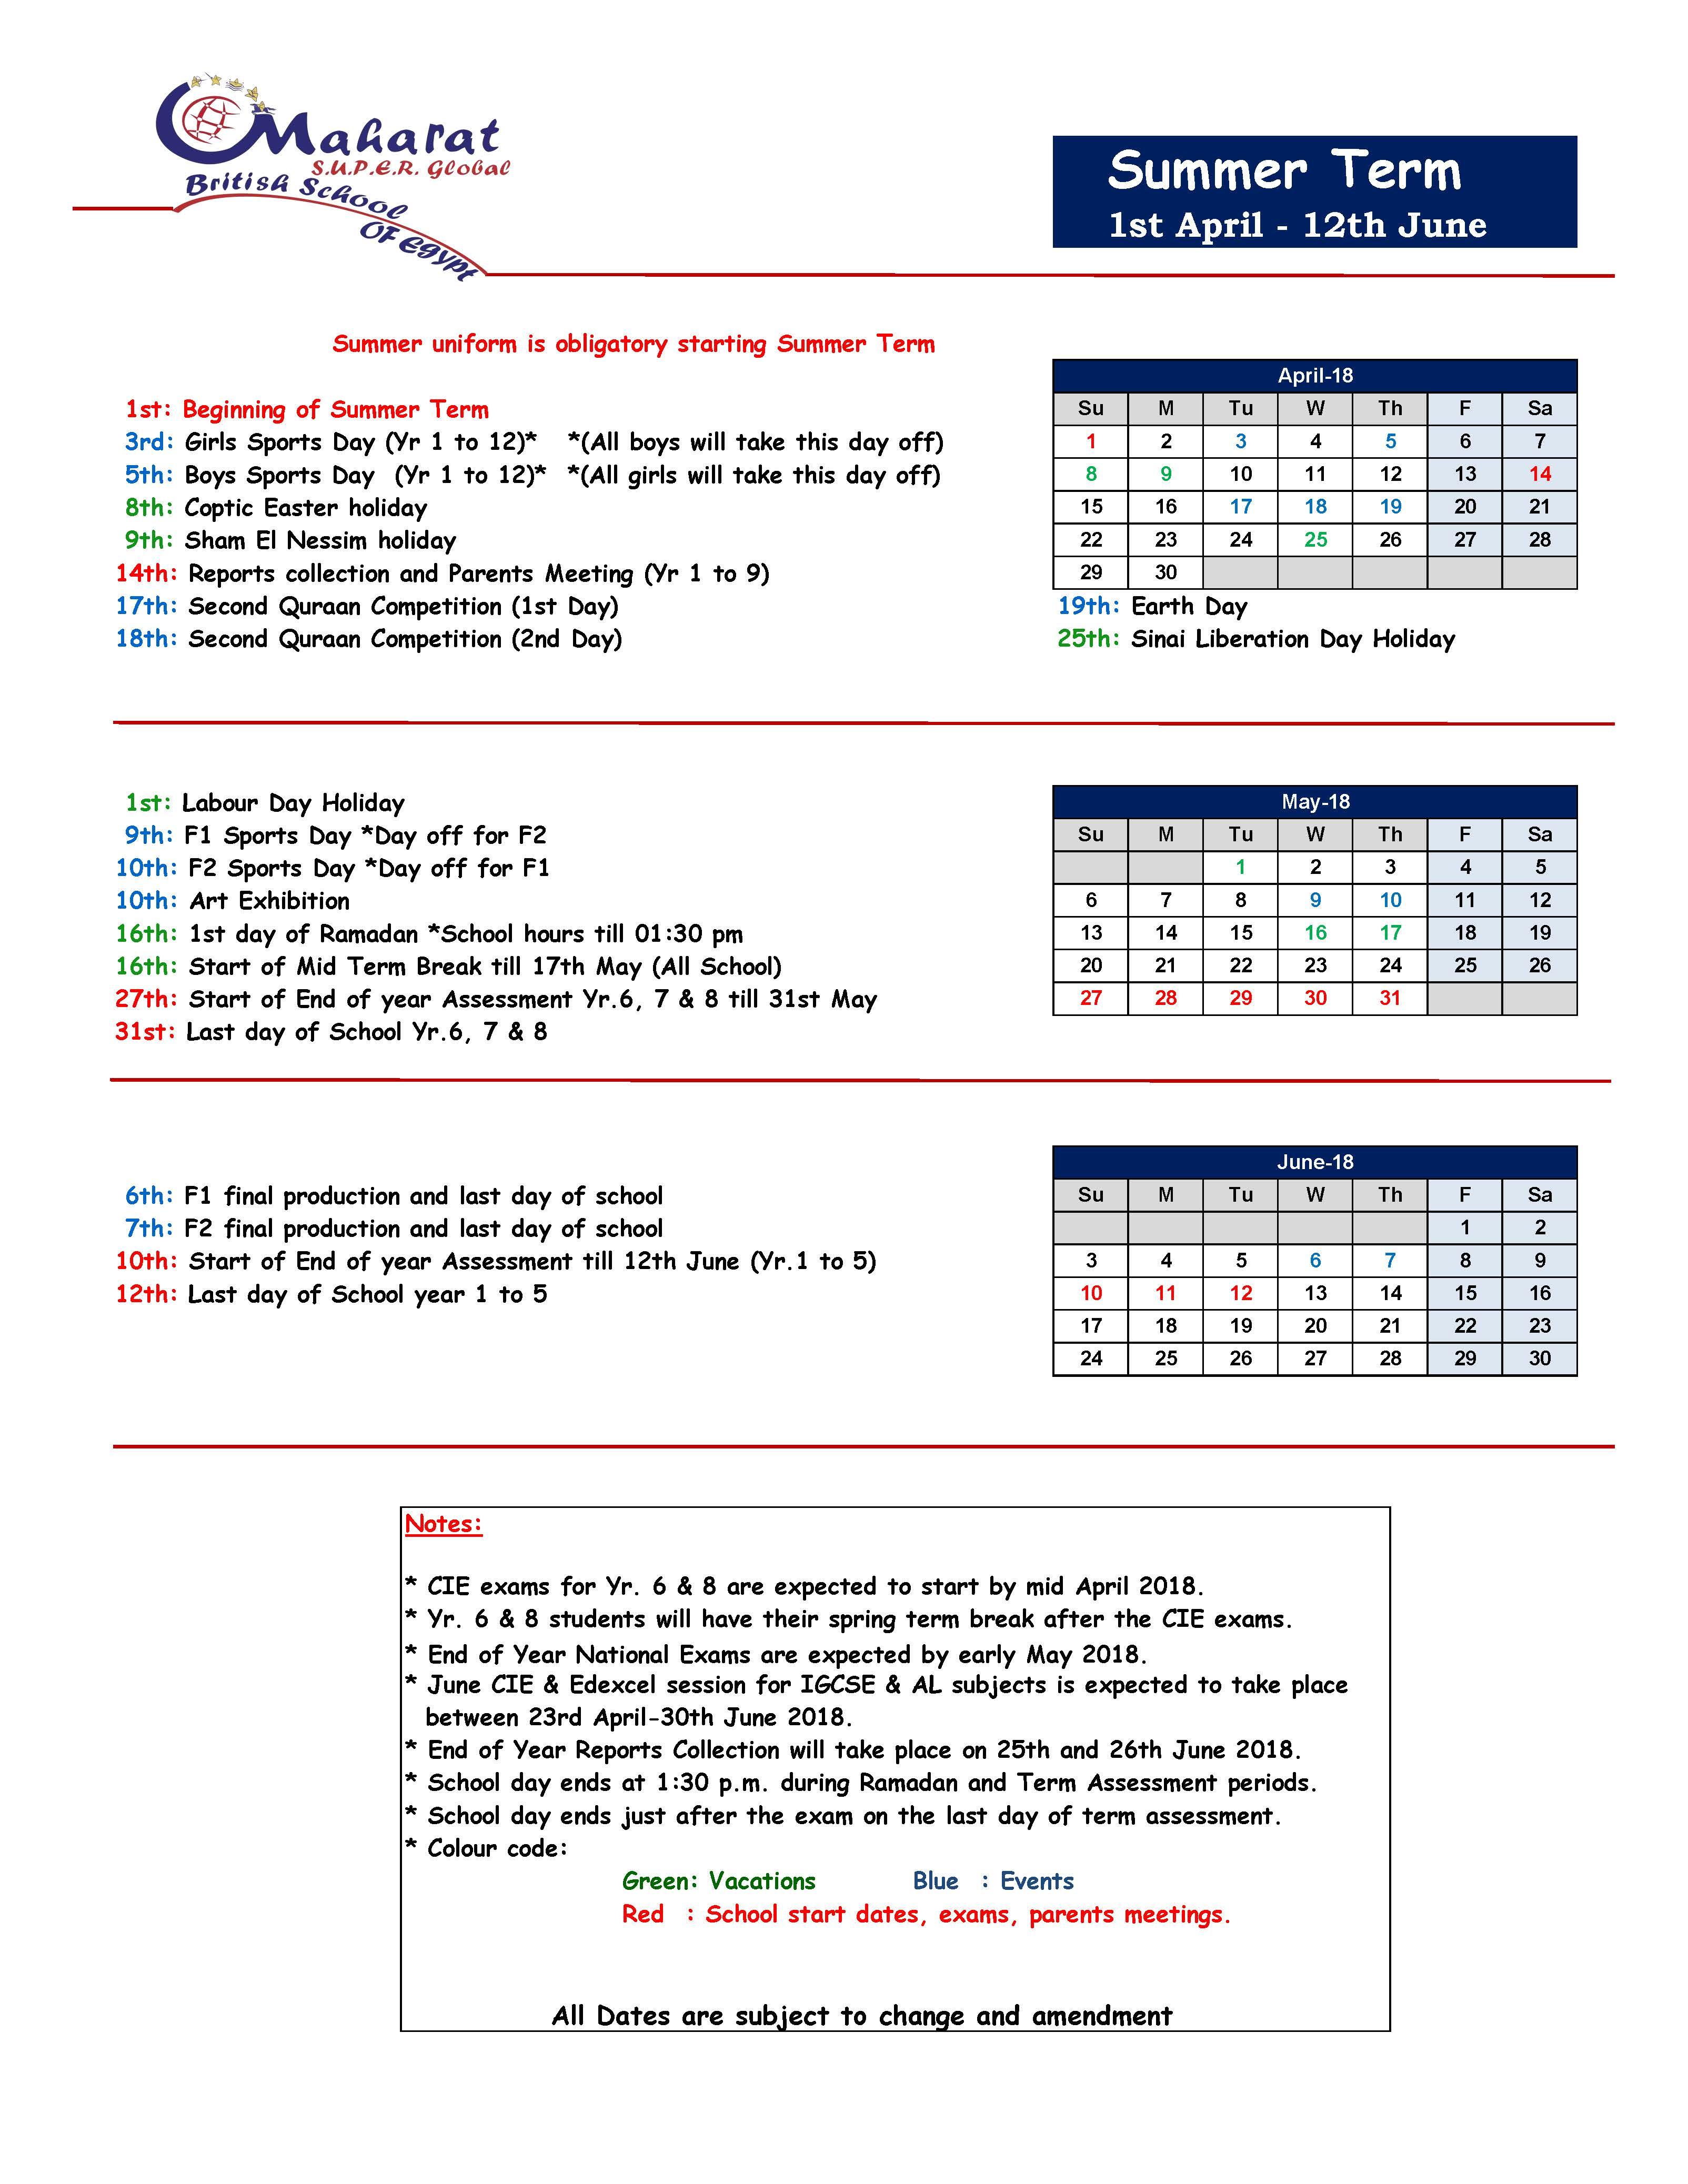 Msg Calendar.Calendar 2017 2018 Maharat Super Global